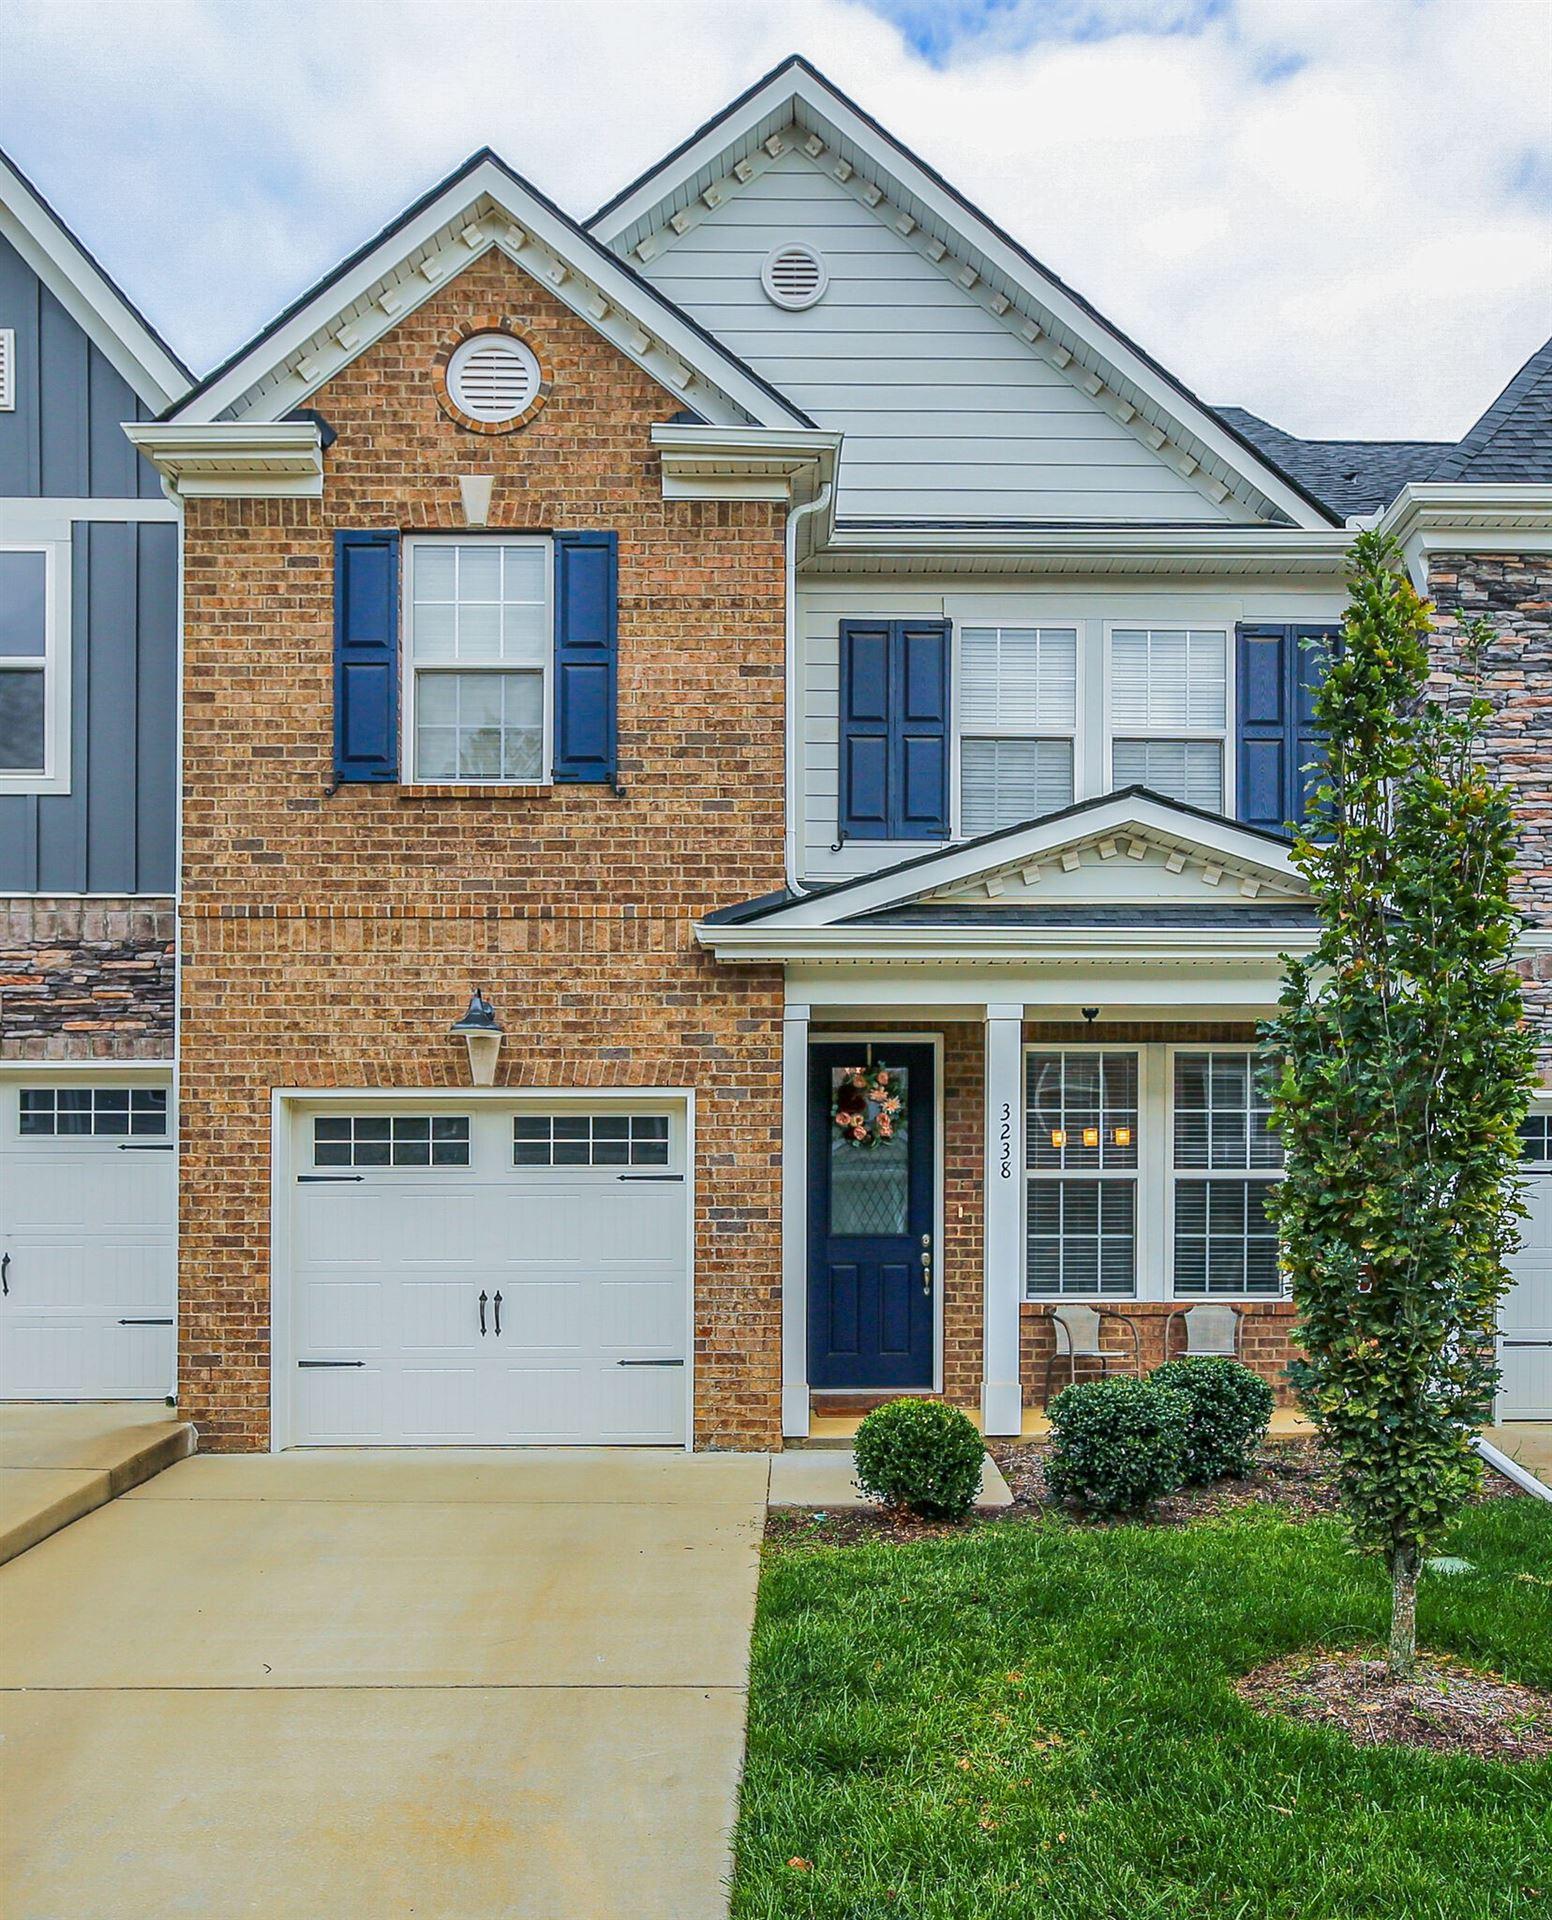 Photo of 3238 Brookberry Ln, Murfreesboro, TN 37129 (MLS # 2300153)